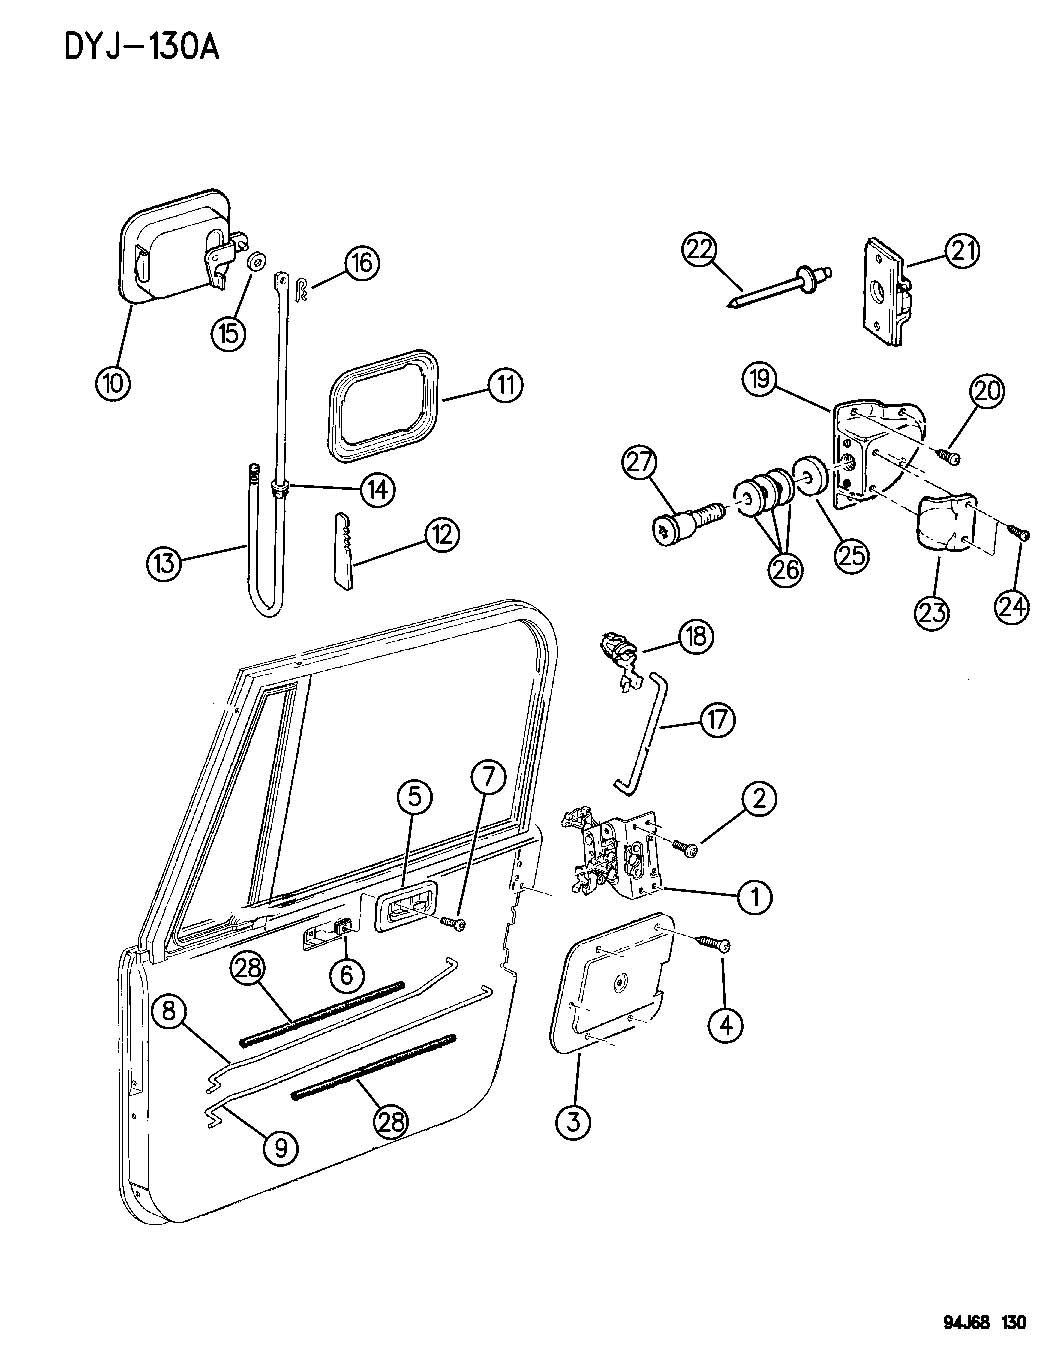 Diagram Jeep Wrangler Door Lock Wiring Diagram Full